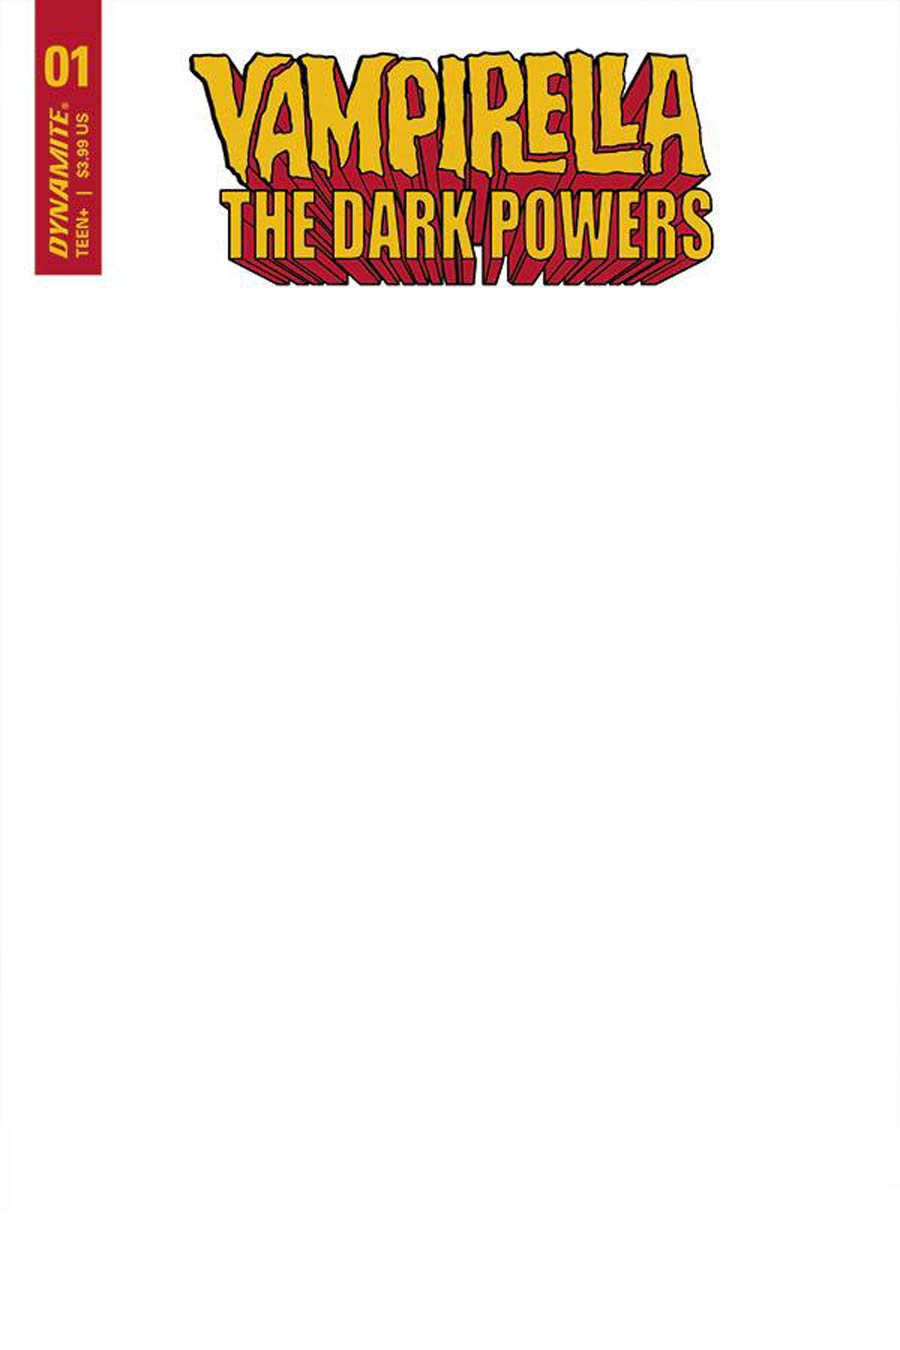 Vampirella The Dark Powers #1 Cover F Variant Blank Authentix Cover